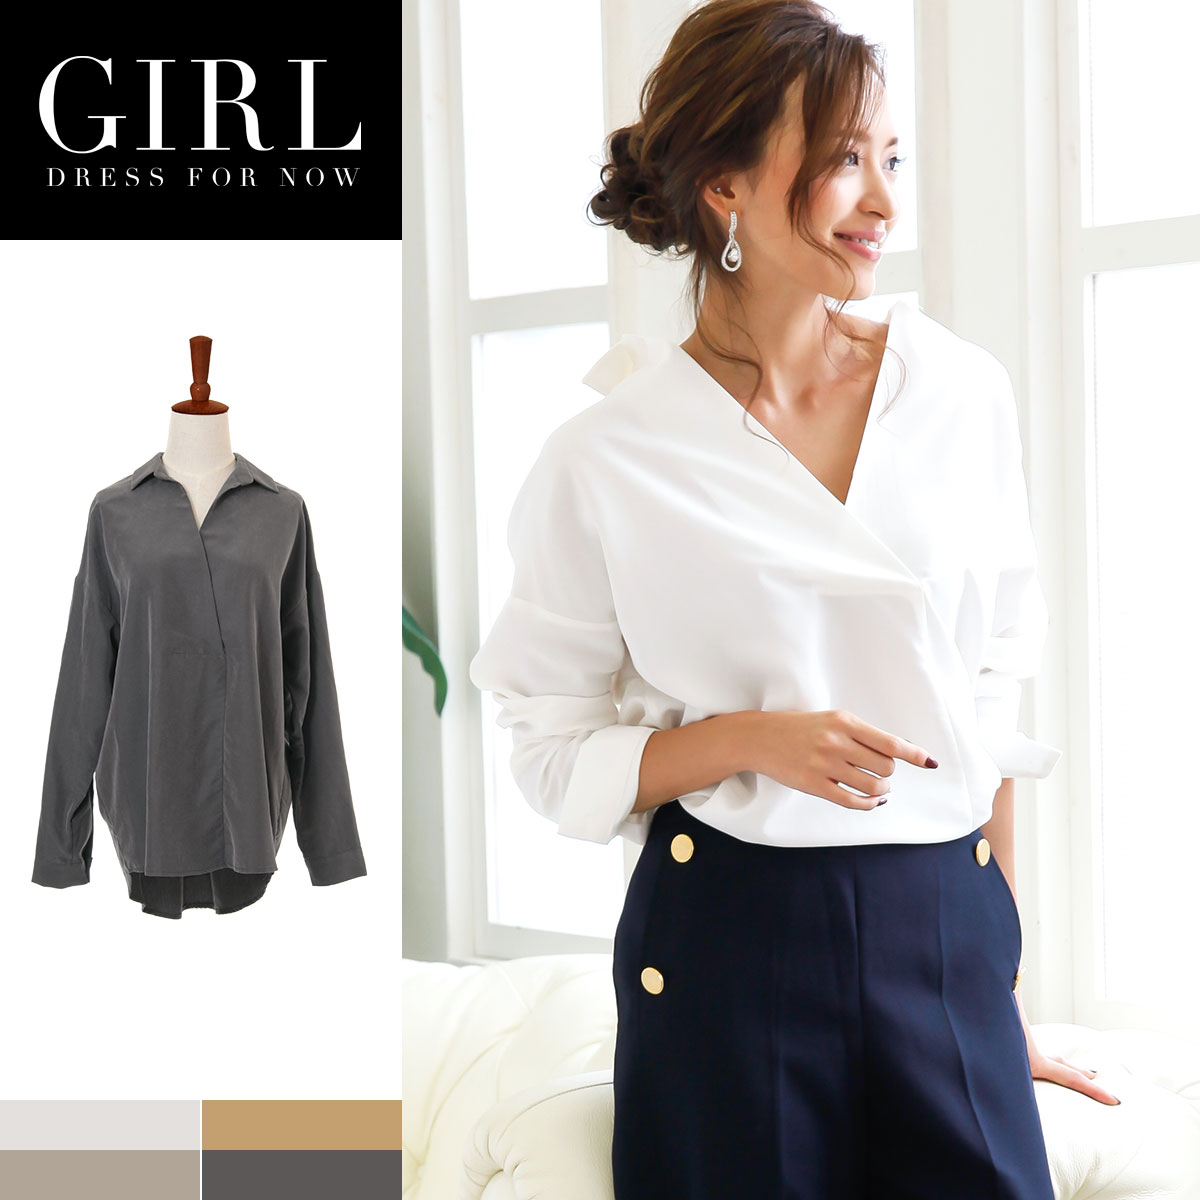 Dress Shop Girl Tops Blouse Pullover Designate So T Shirts Womens